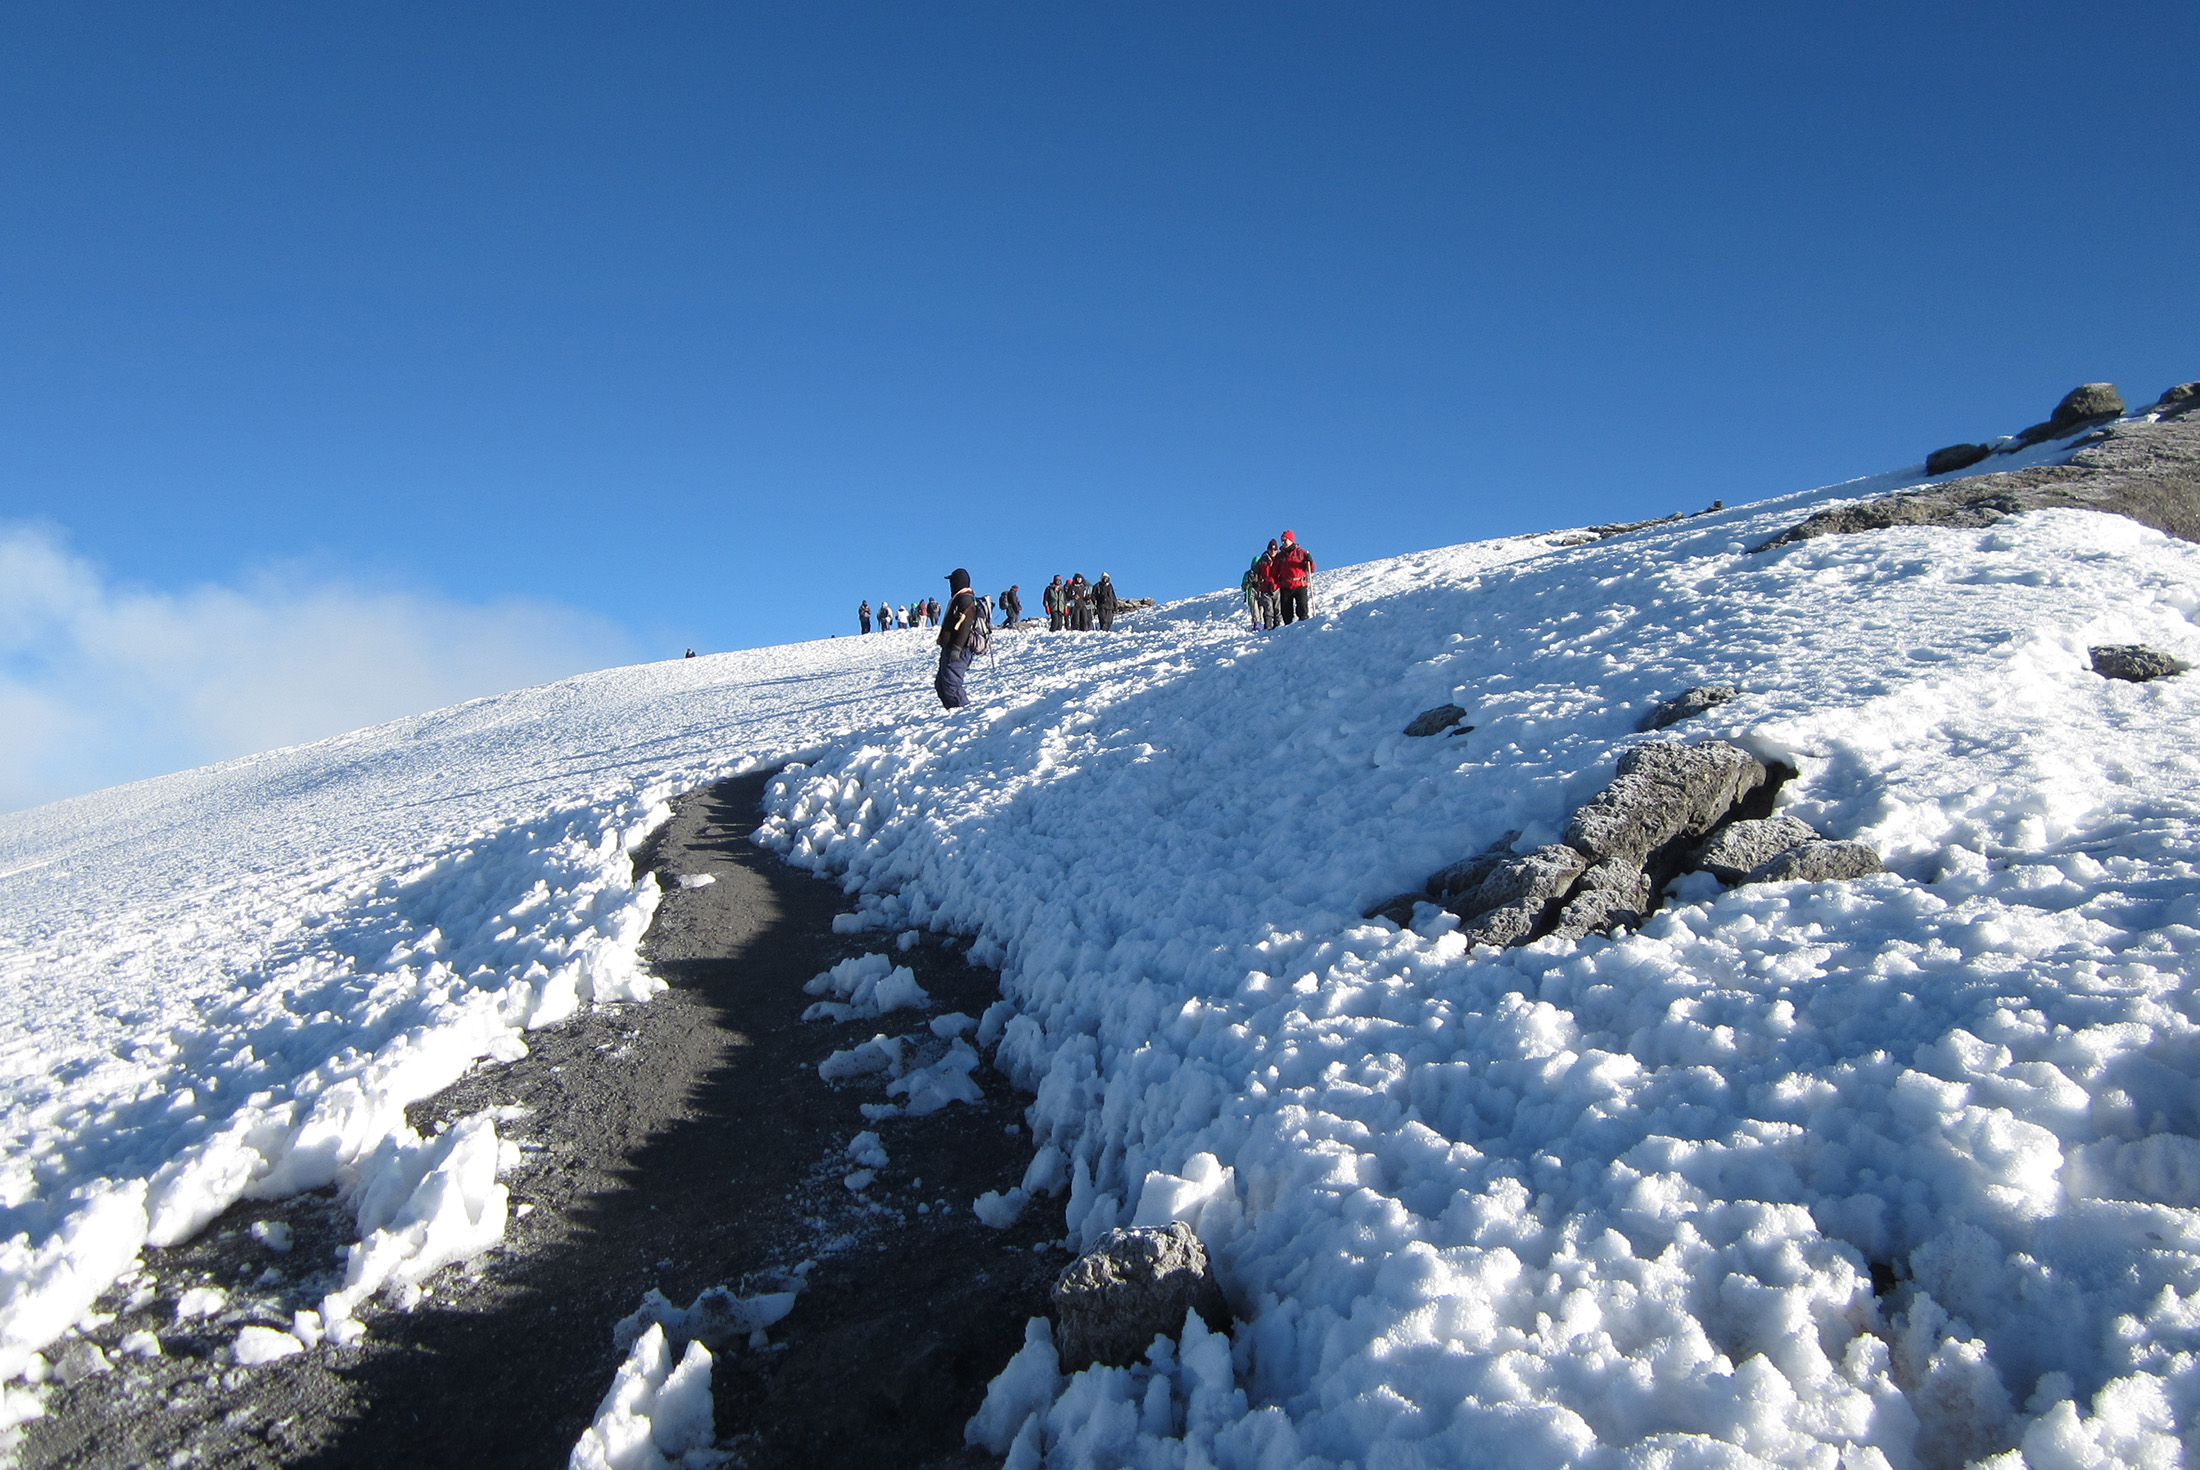 Mt Kilimanjaro Climb - Marangu Route 3